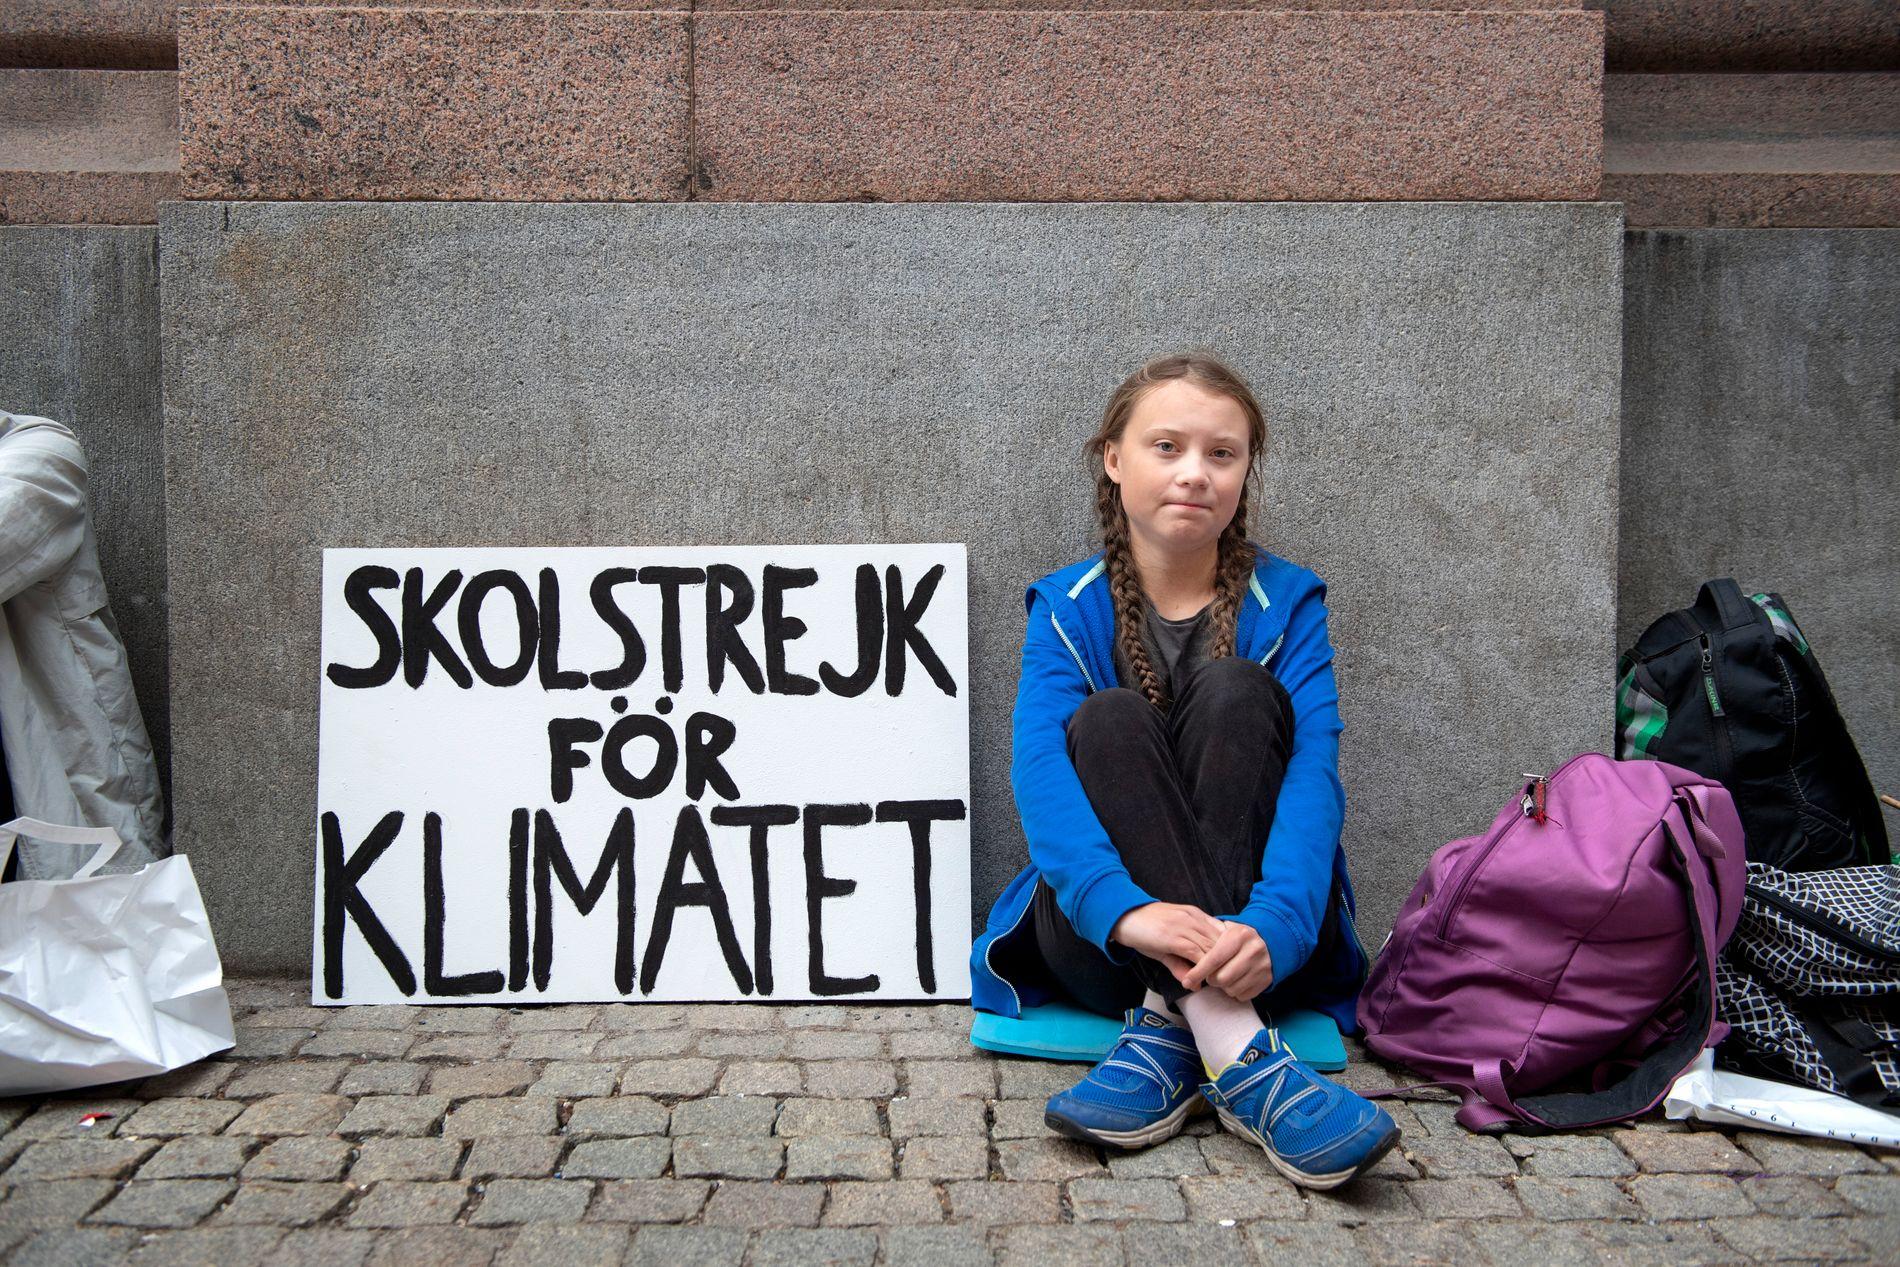 SKOLESTREIK: Her sitter Greta, den gang 15 år, streikende foran Riksdagen i Sverige.